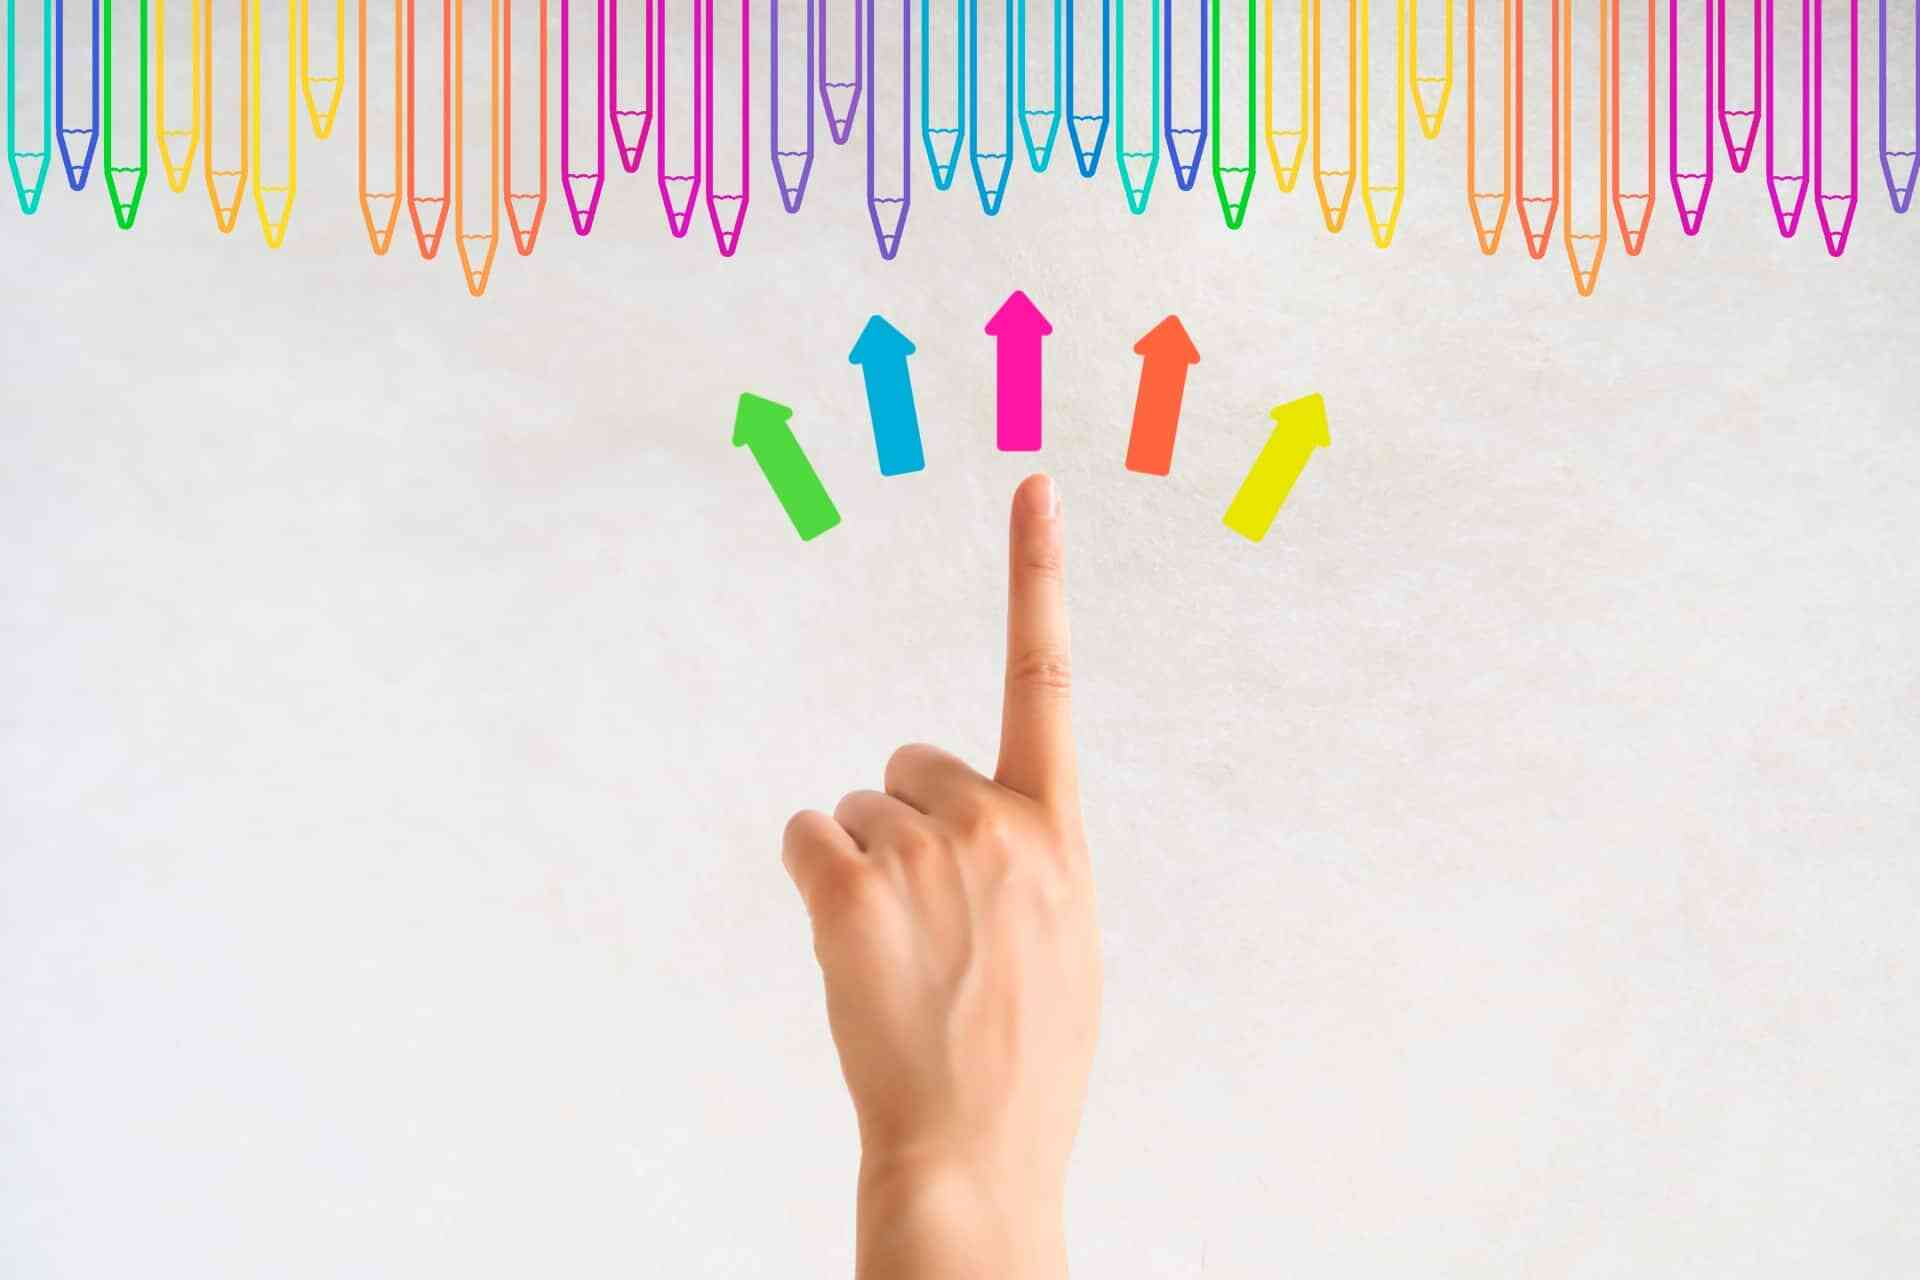 SPIで適性検査する4割の企業は性格判定を重視!気になる内容と結果